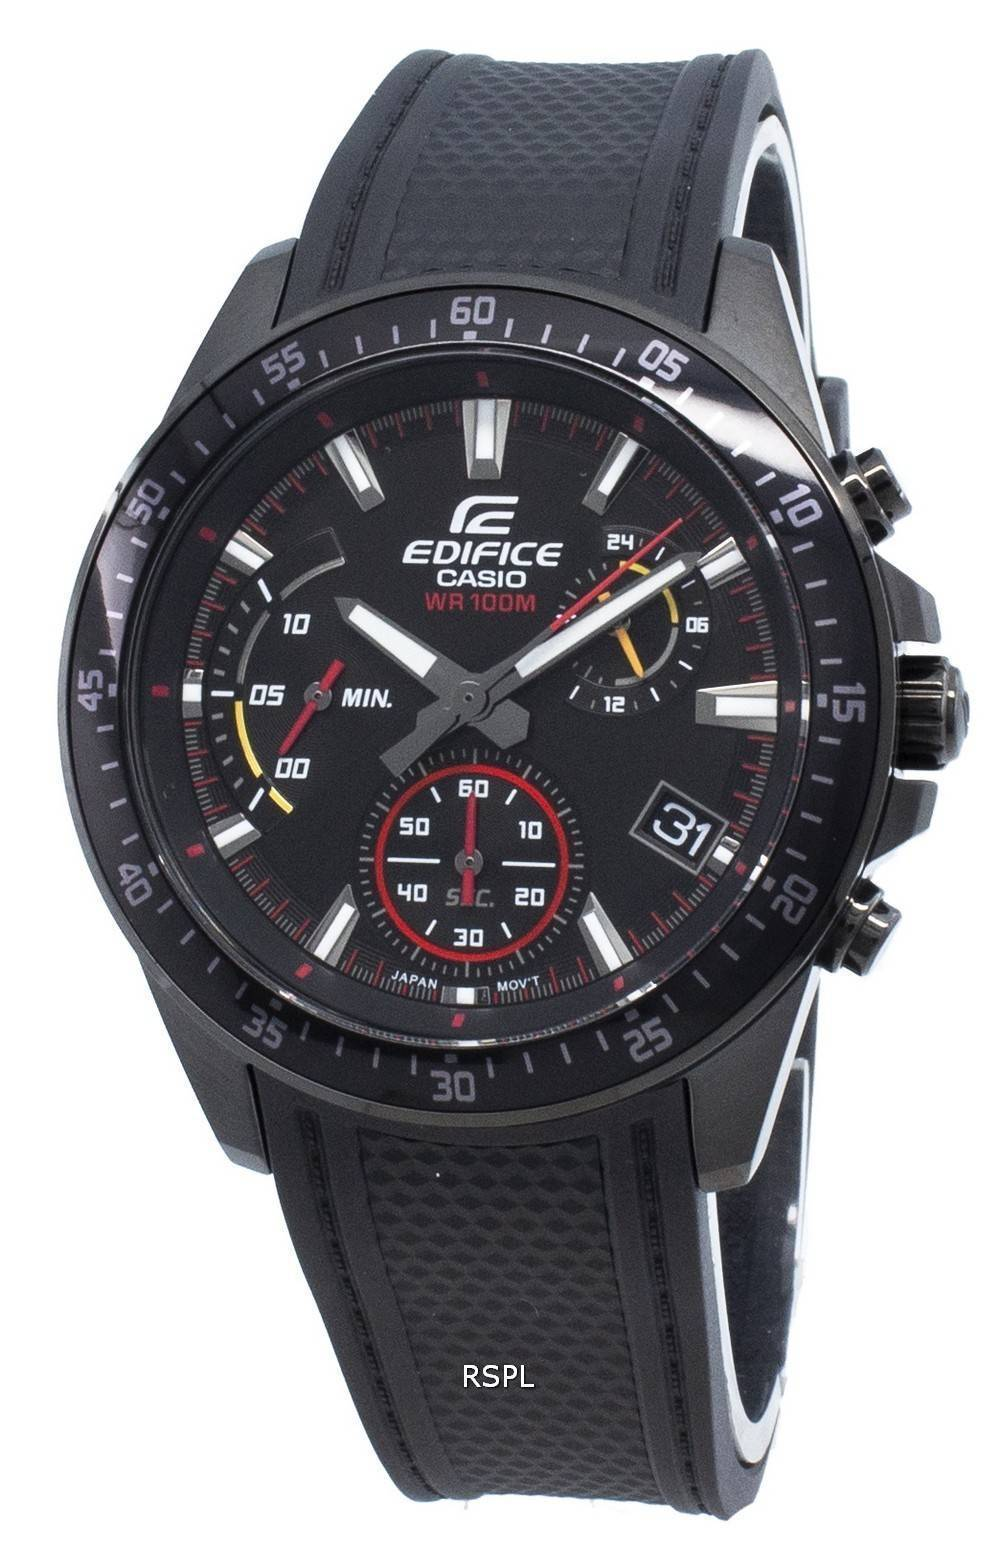 Casio Edifice EFV-540PB-1AV EFV540PB-1AV Chronograph miesten kello